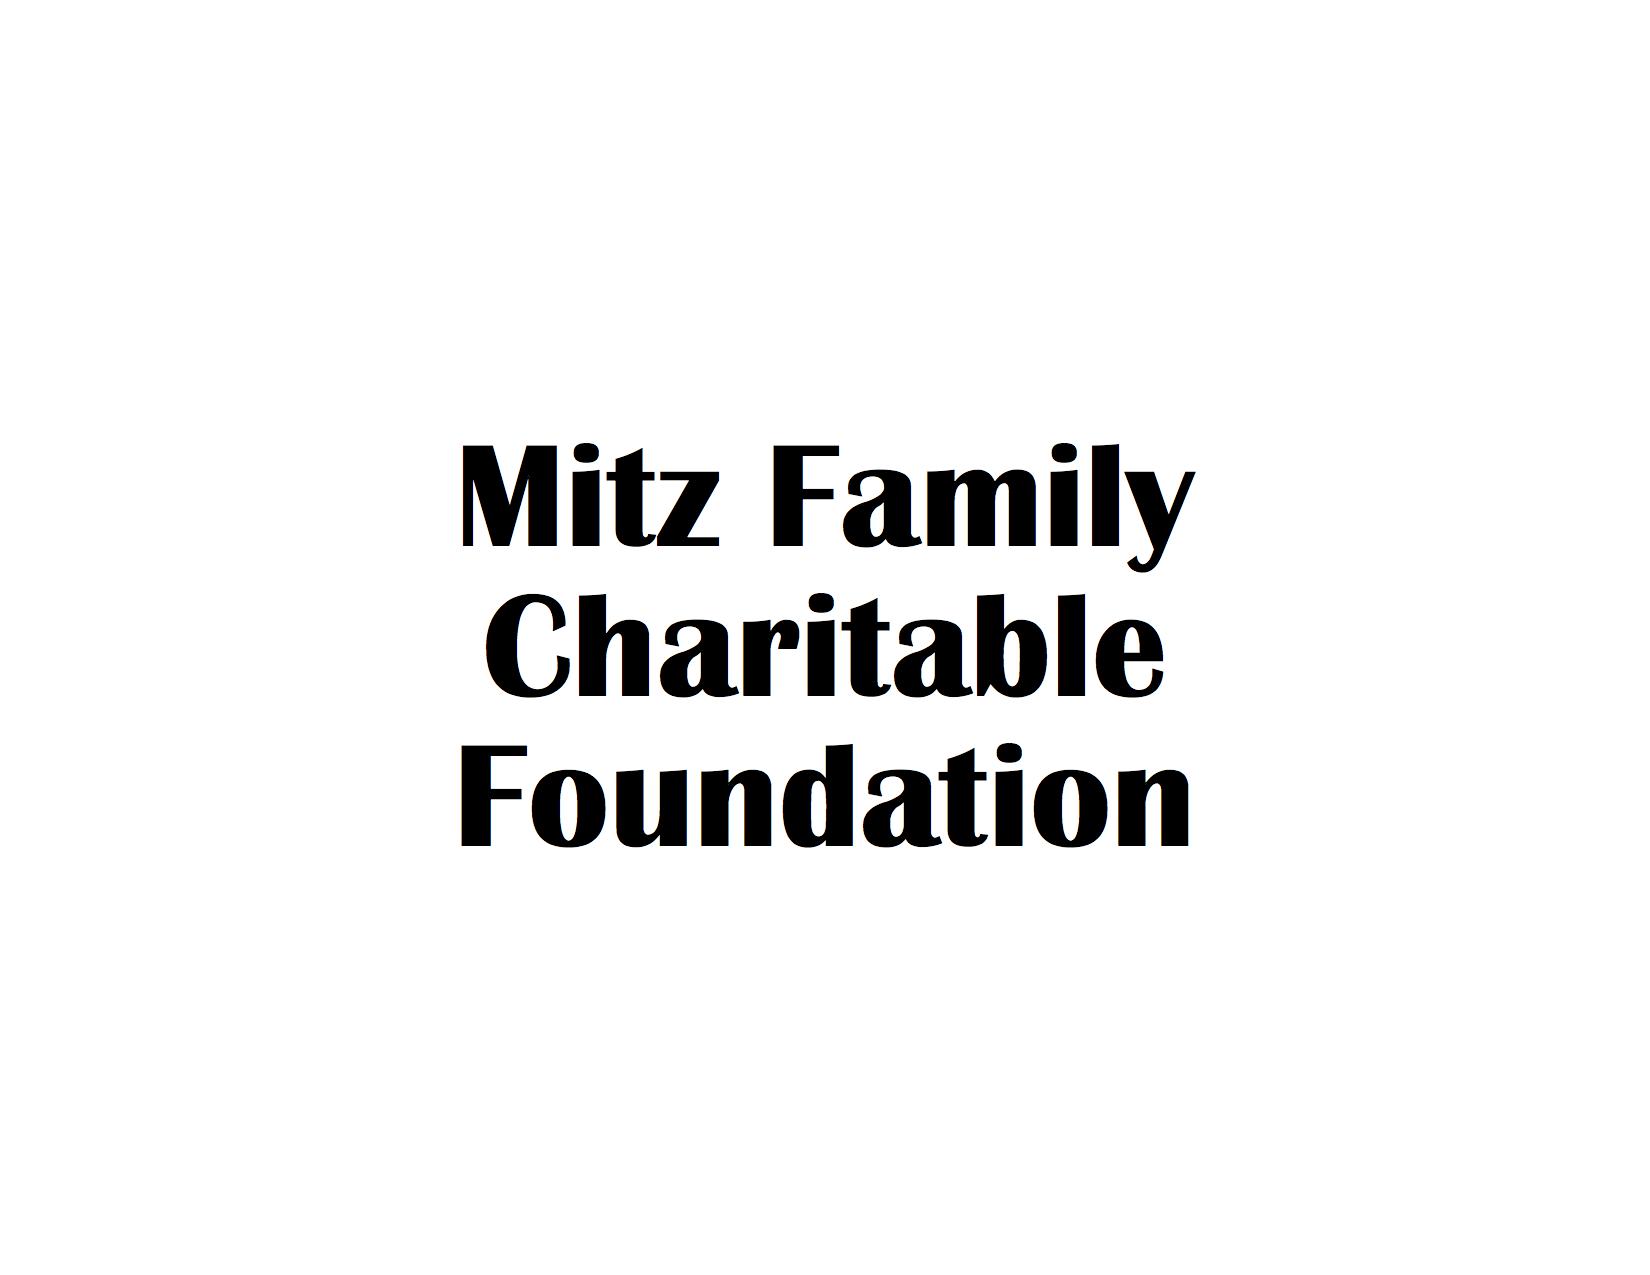 Mitz Family Charitable Foundation Logo.png